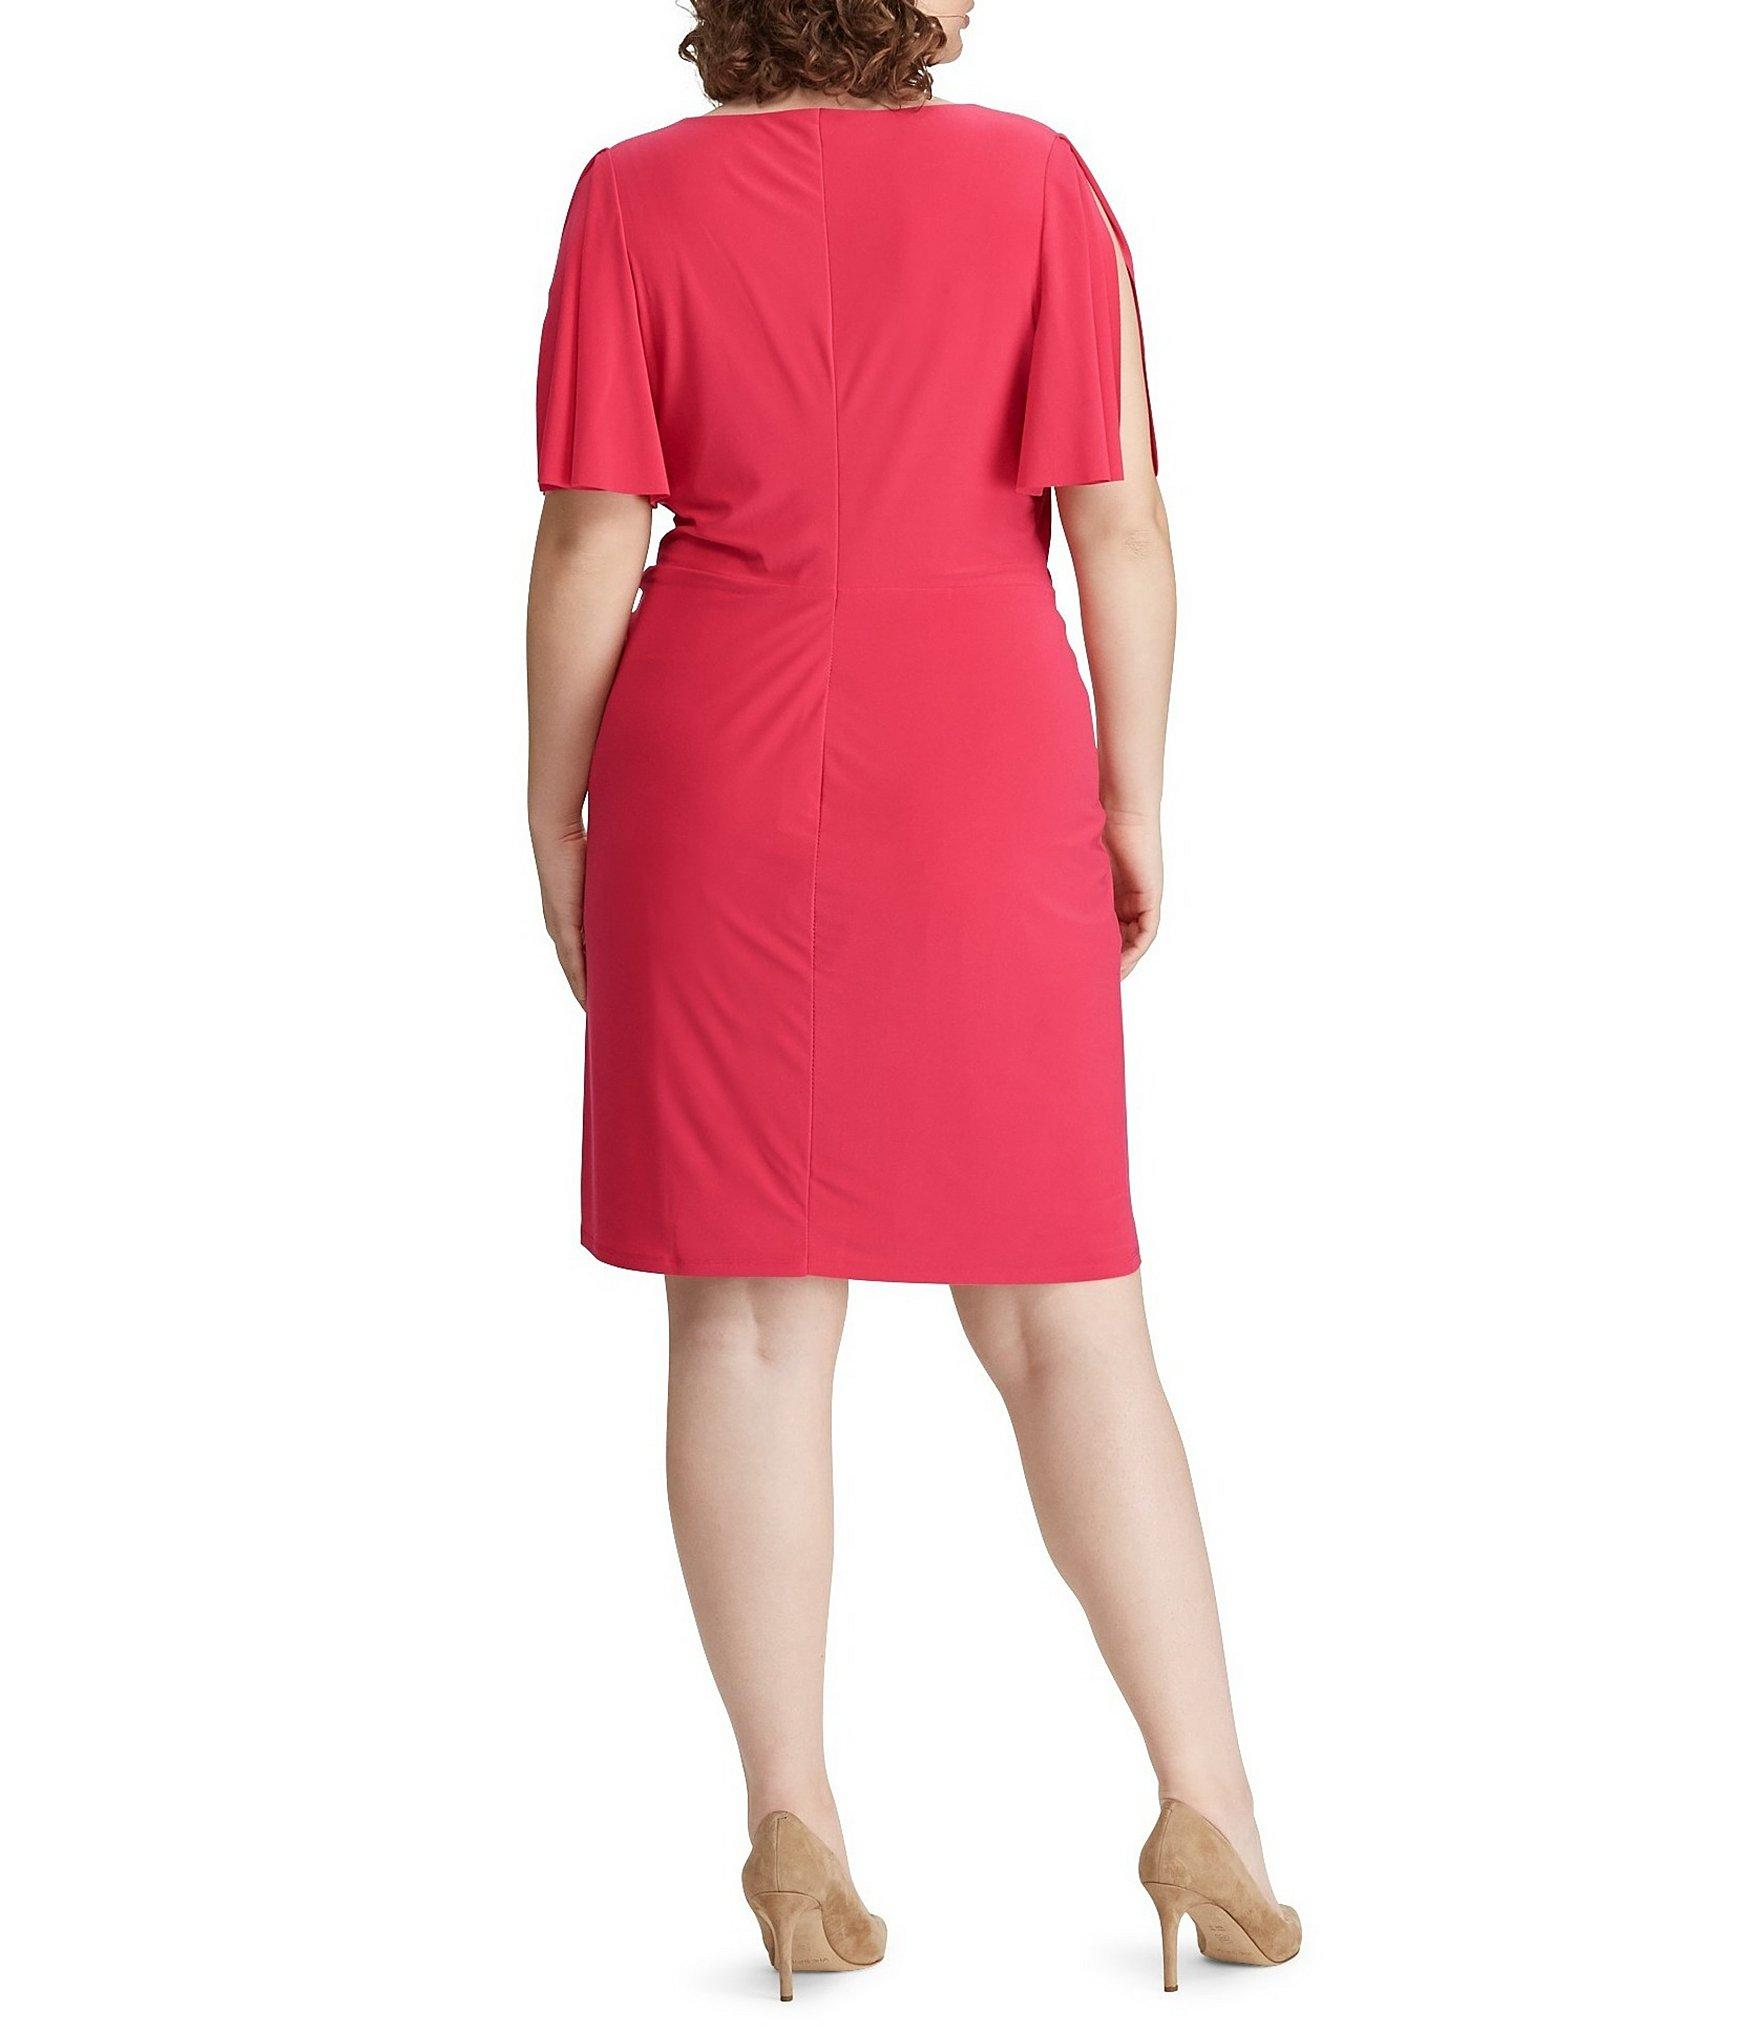 4089bddec00 Lyst - Lauren by Ralph Lauren Plus Size Twisted Knot Jersey Dress in Red